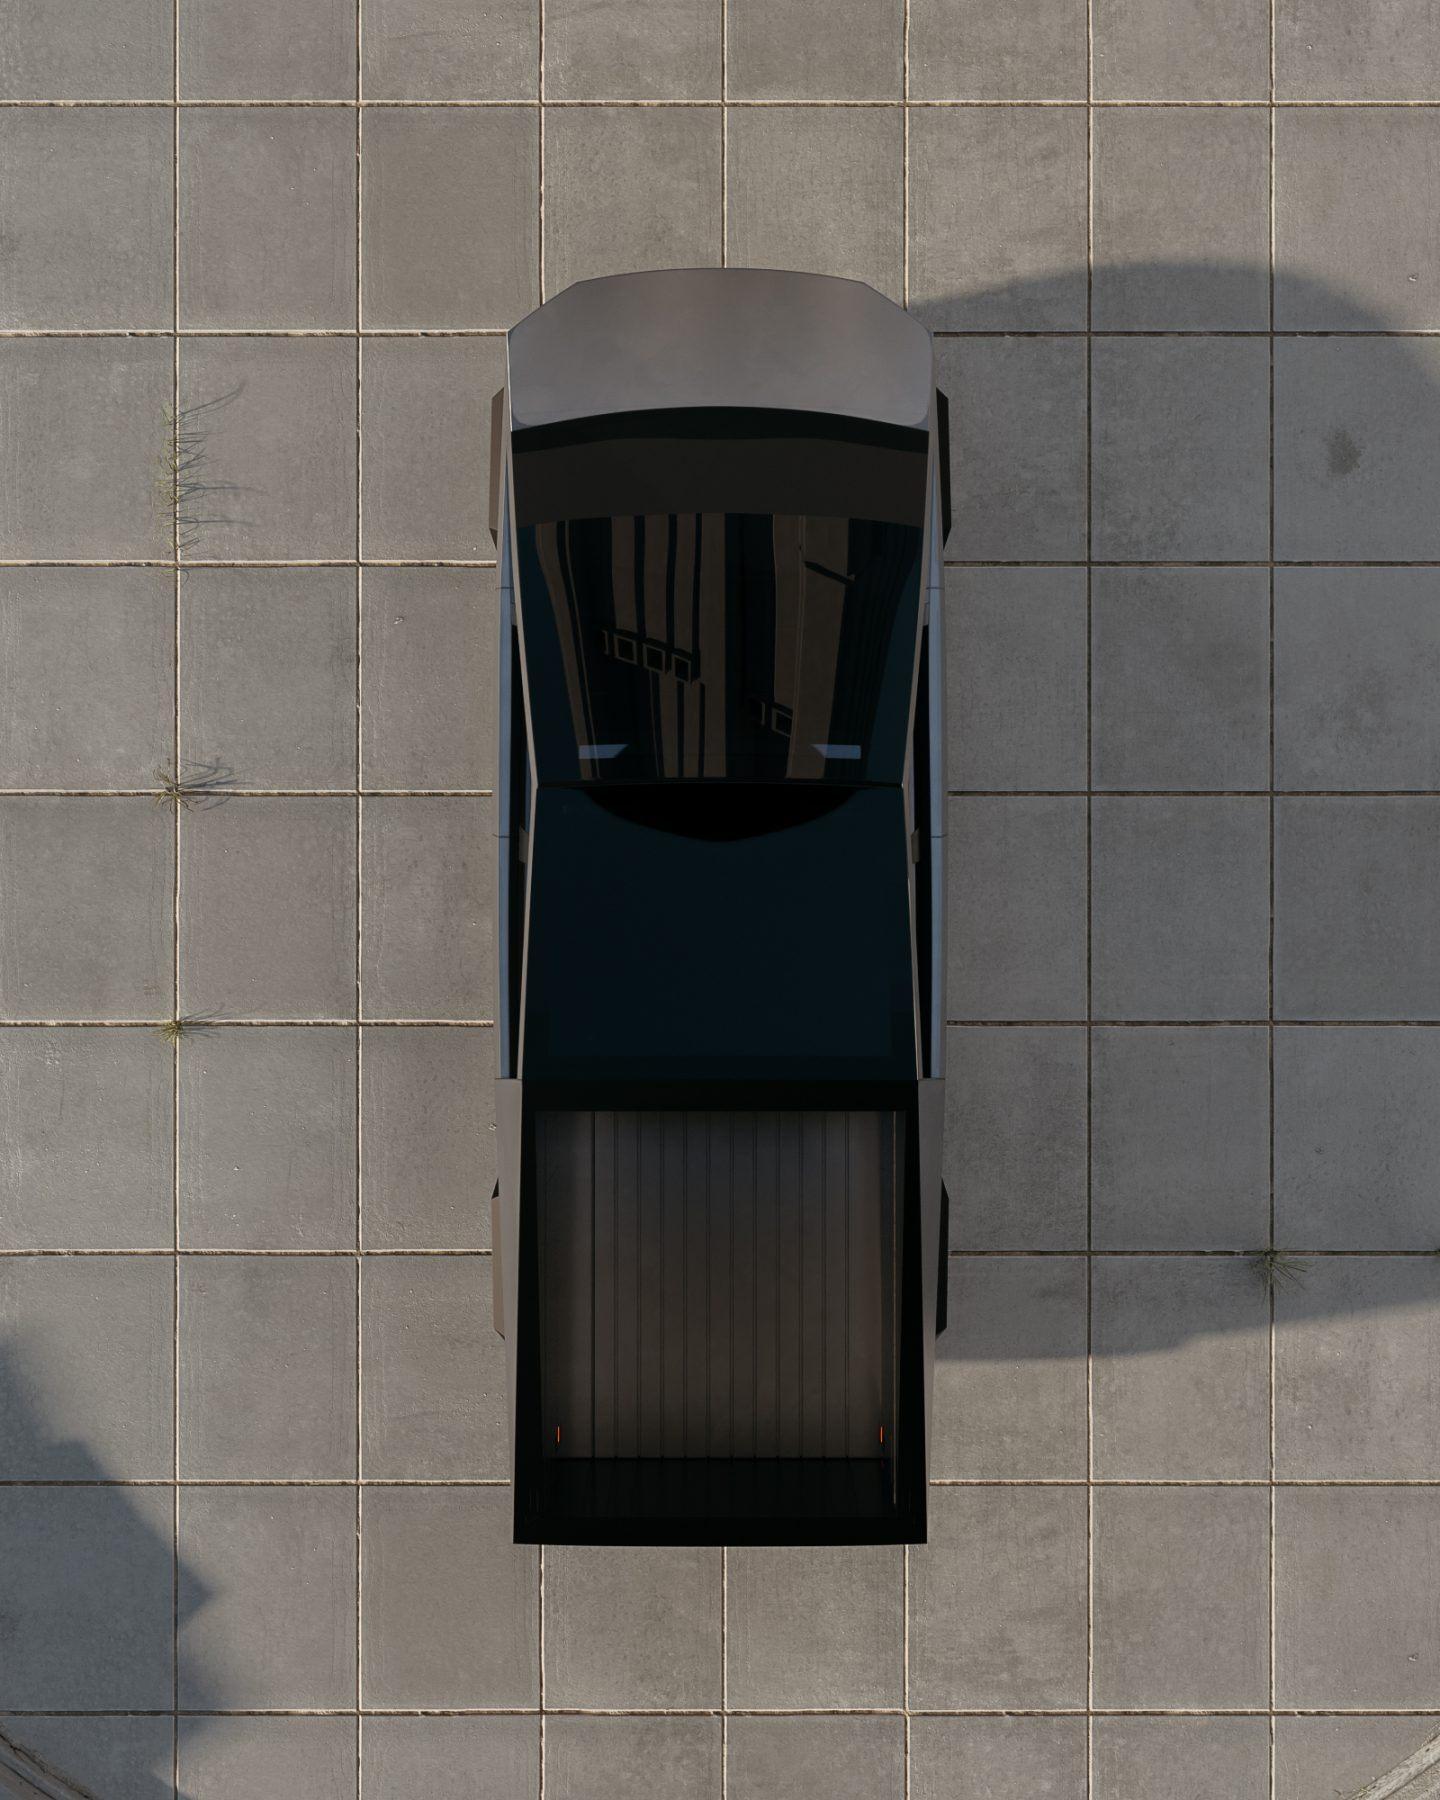 IGNANT-Tesla-cybertruck-cgi-brutalism-cgi-editorial-8